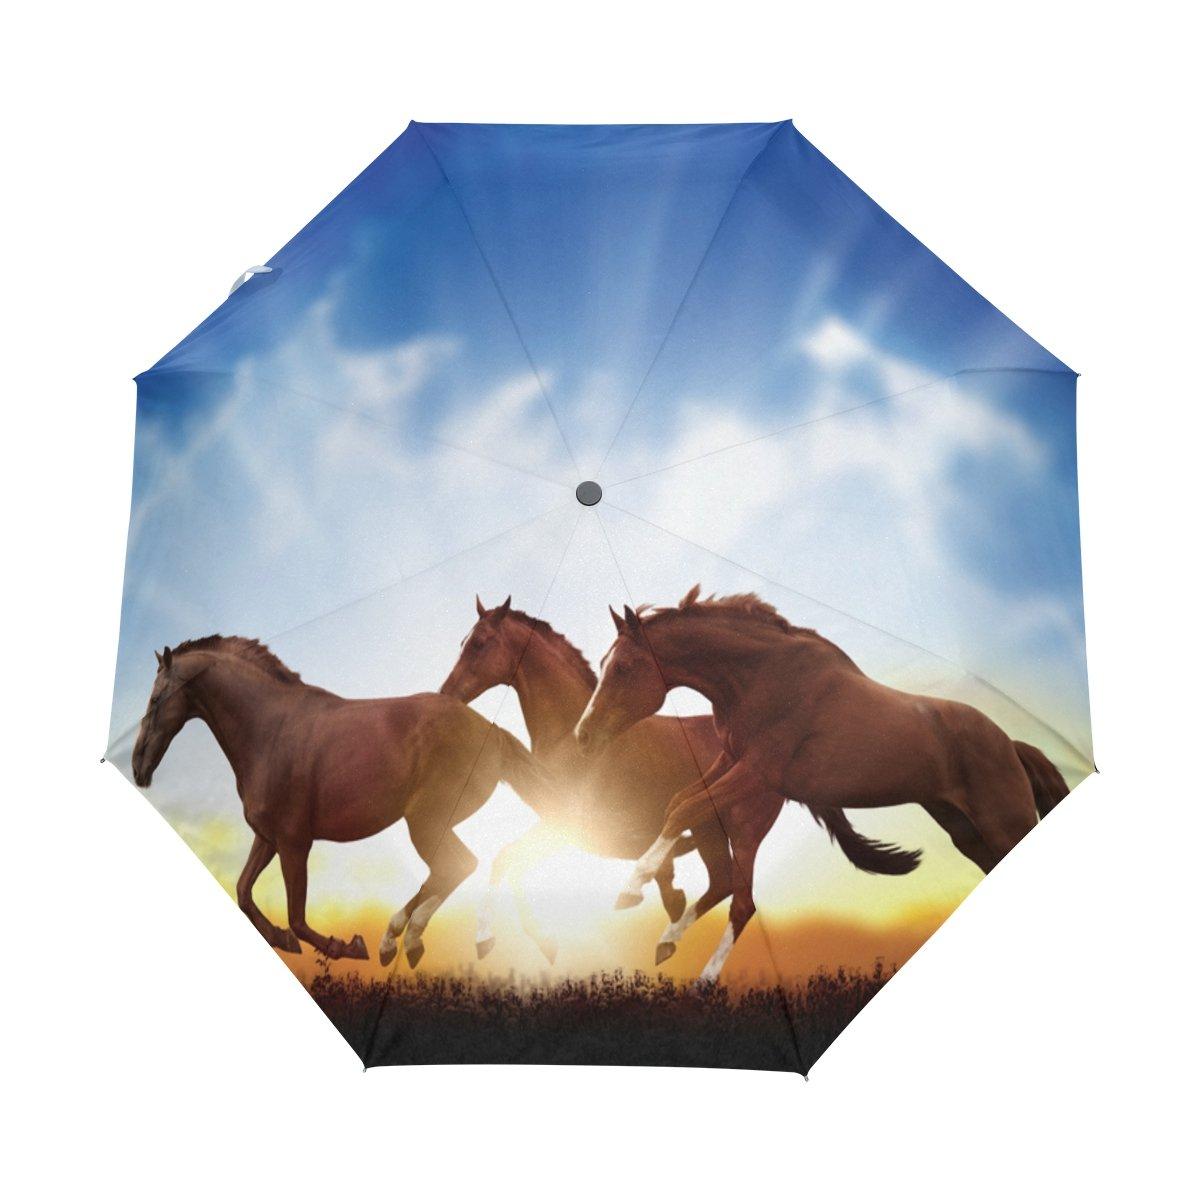 Naanle Running Horses Sunset Blue Sky Auto Open Close Foldable Windproof Umbrella B075ST22BM